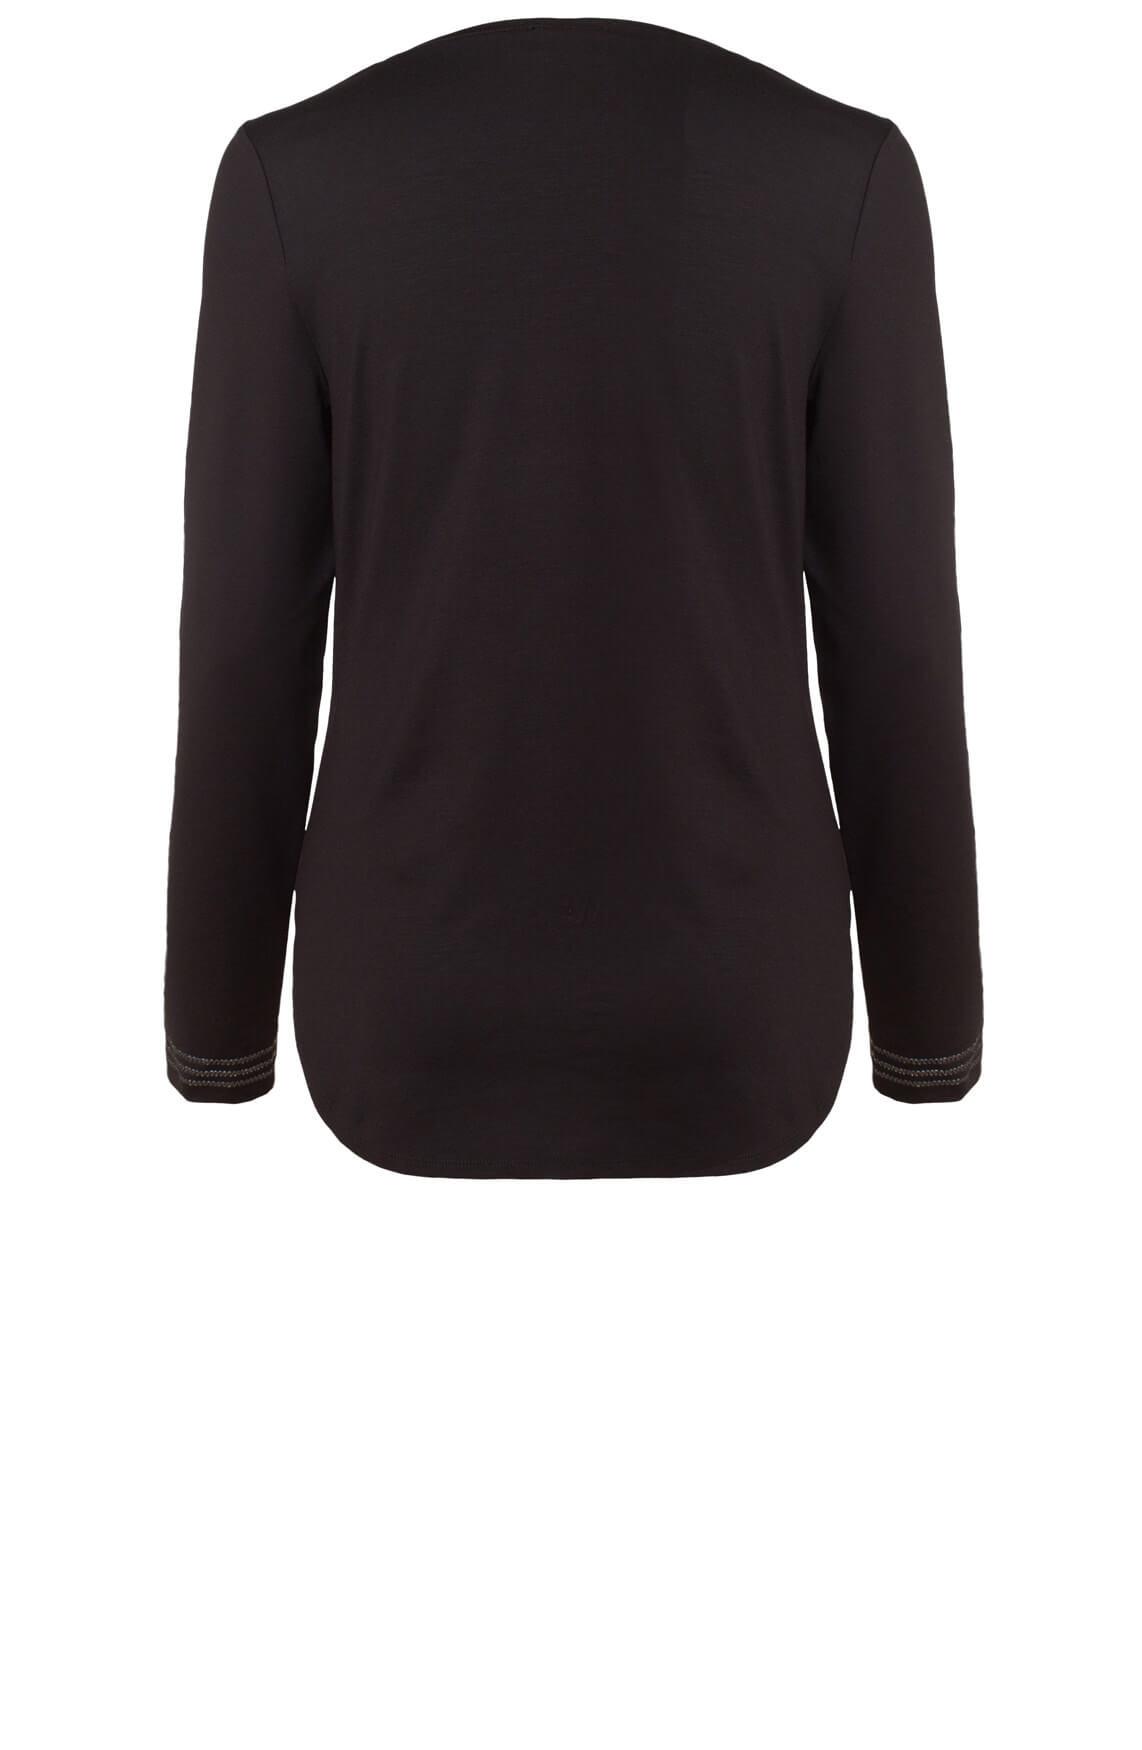 Anna Dames Shirt met stikseldetail zwart